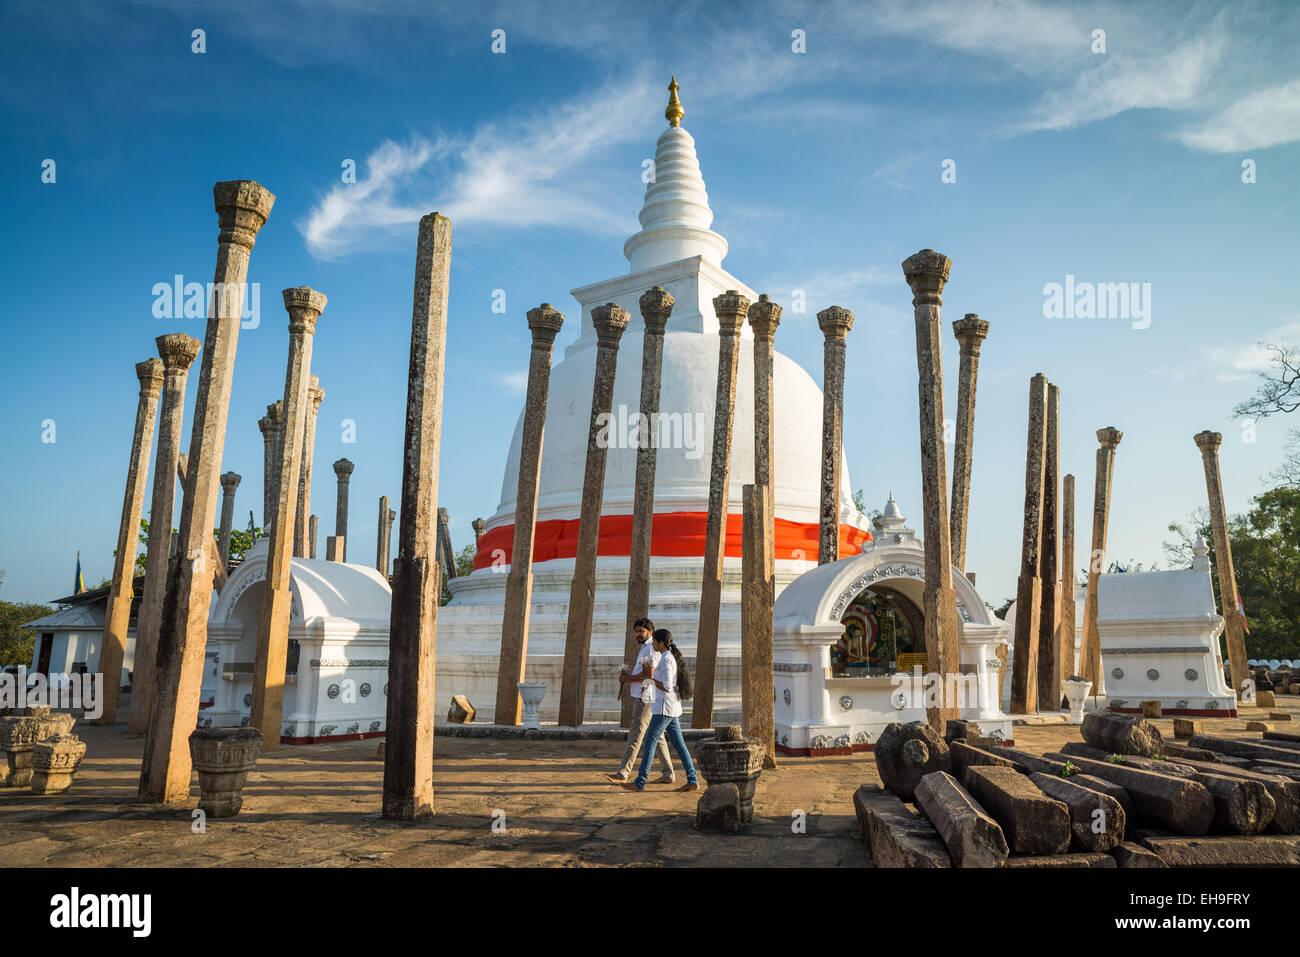 Thuparama Dagoba, Anuradhapura, UNESCO World Heritage Site, North Central Province, Sri Lanka, Asia Stock Photo